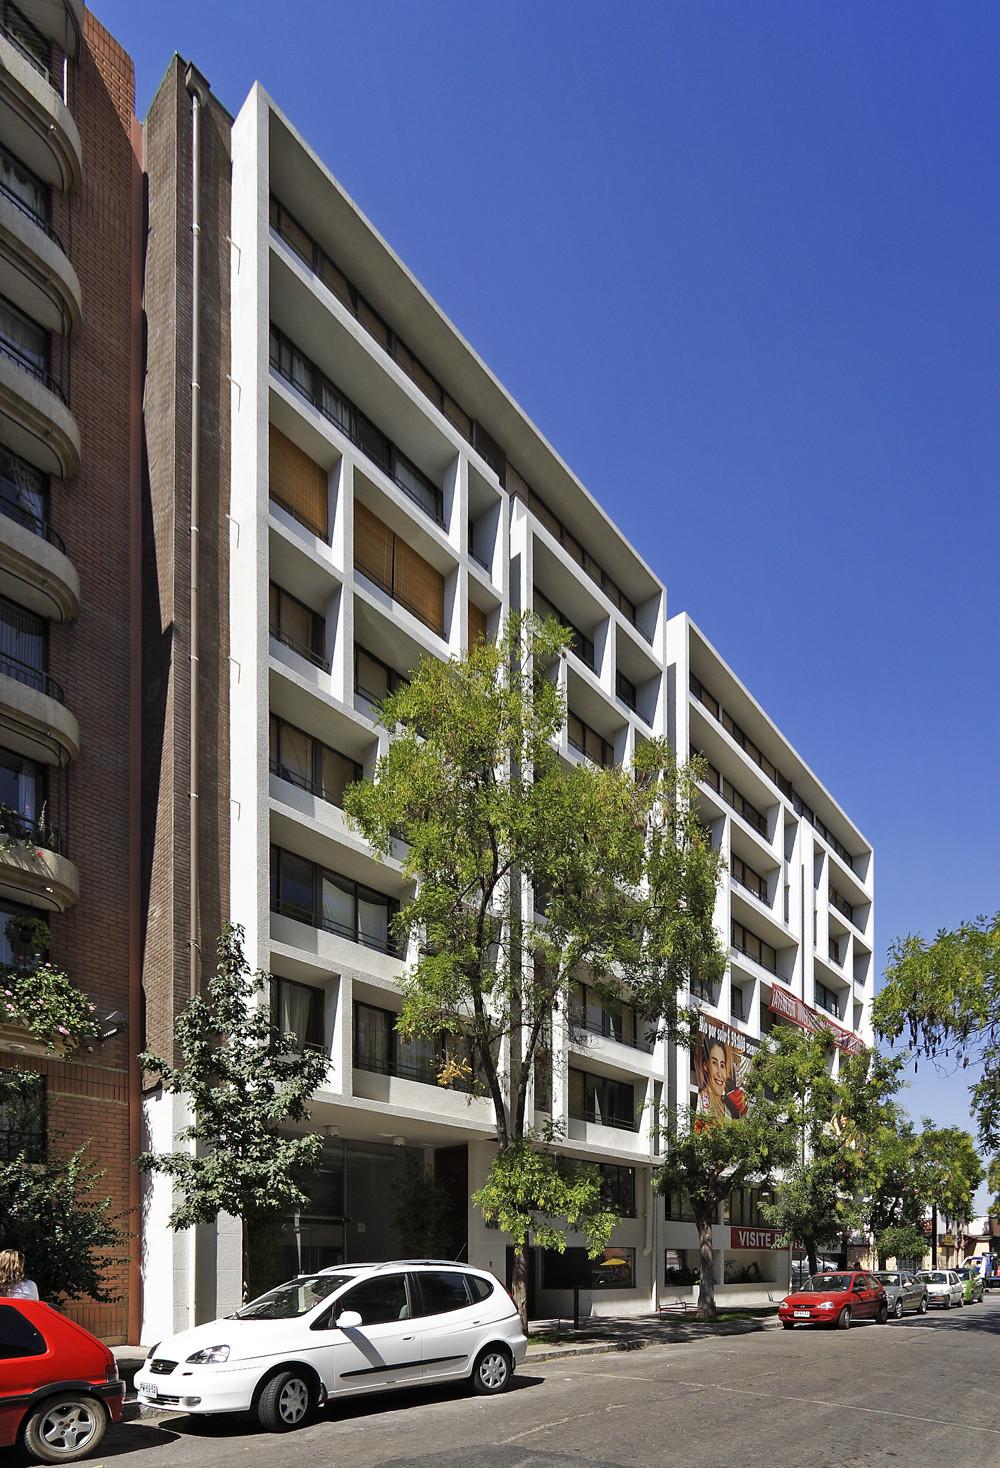 Edificio Arte Urbano / MAO Arquitectos, © Pedro Mutis